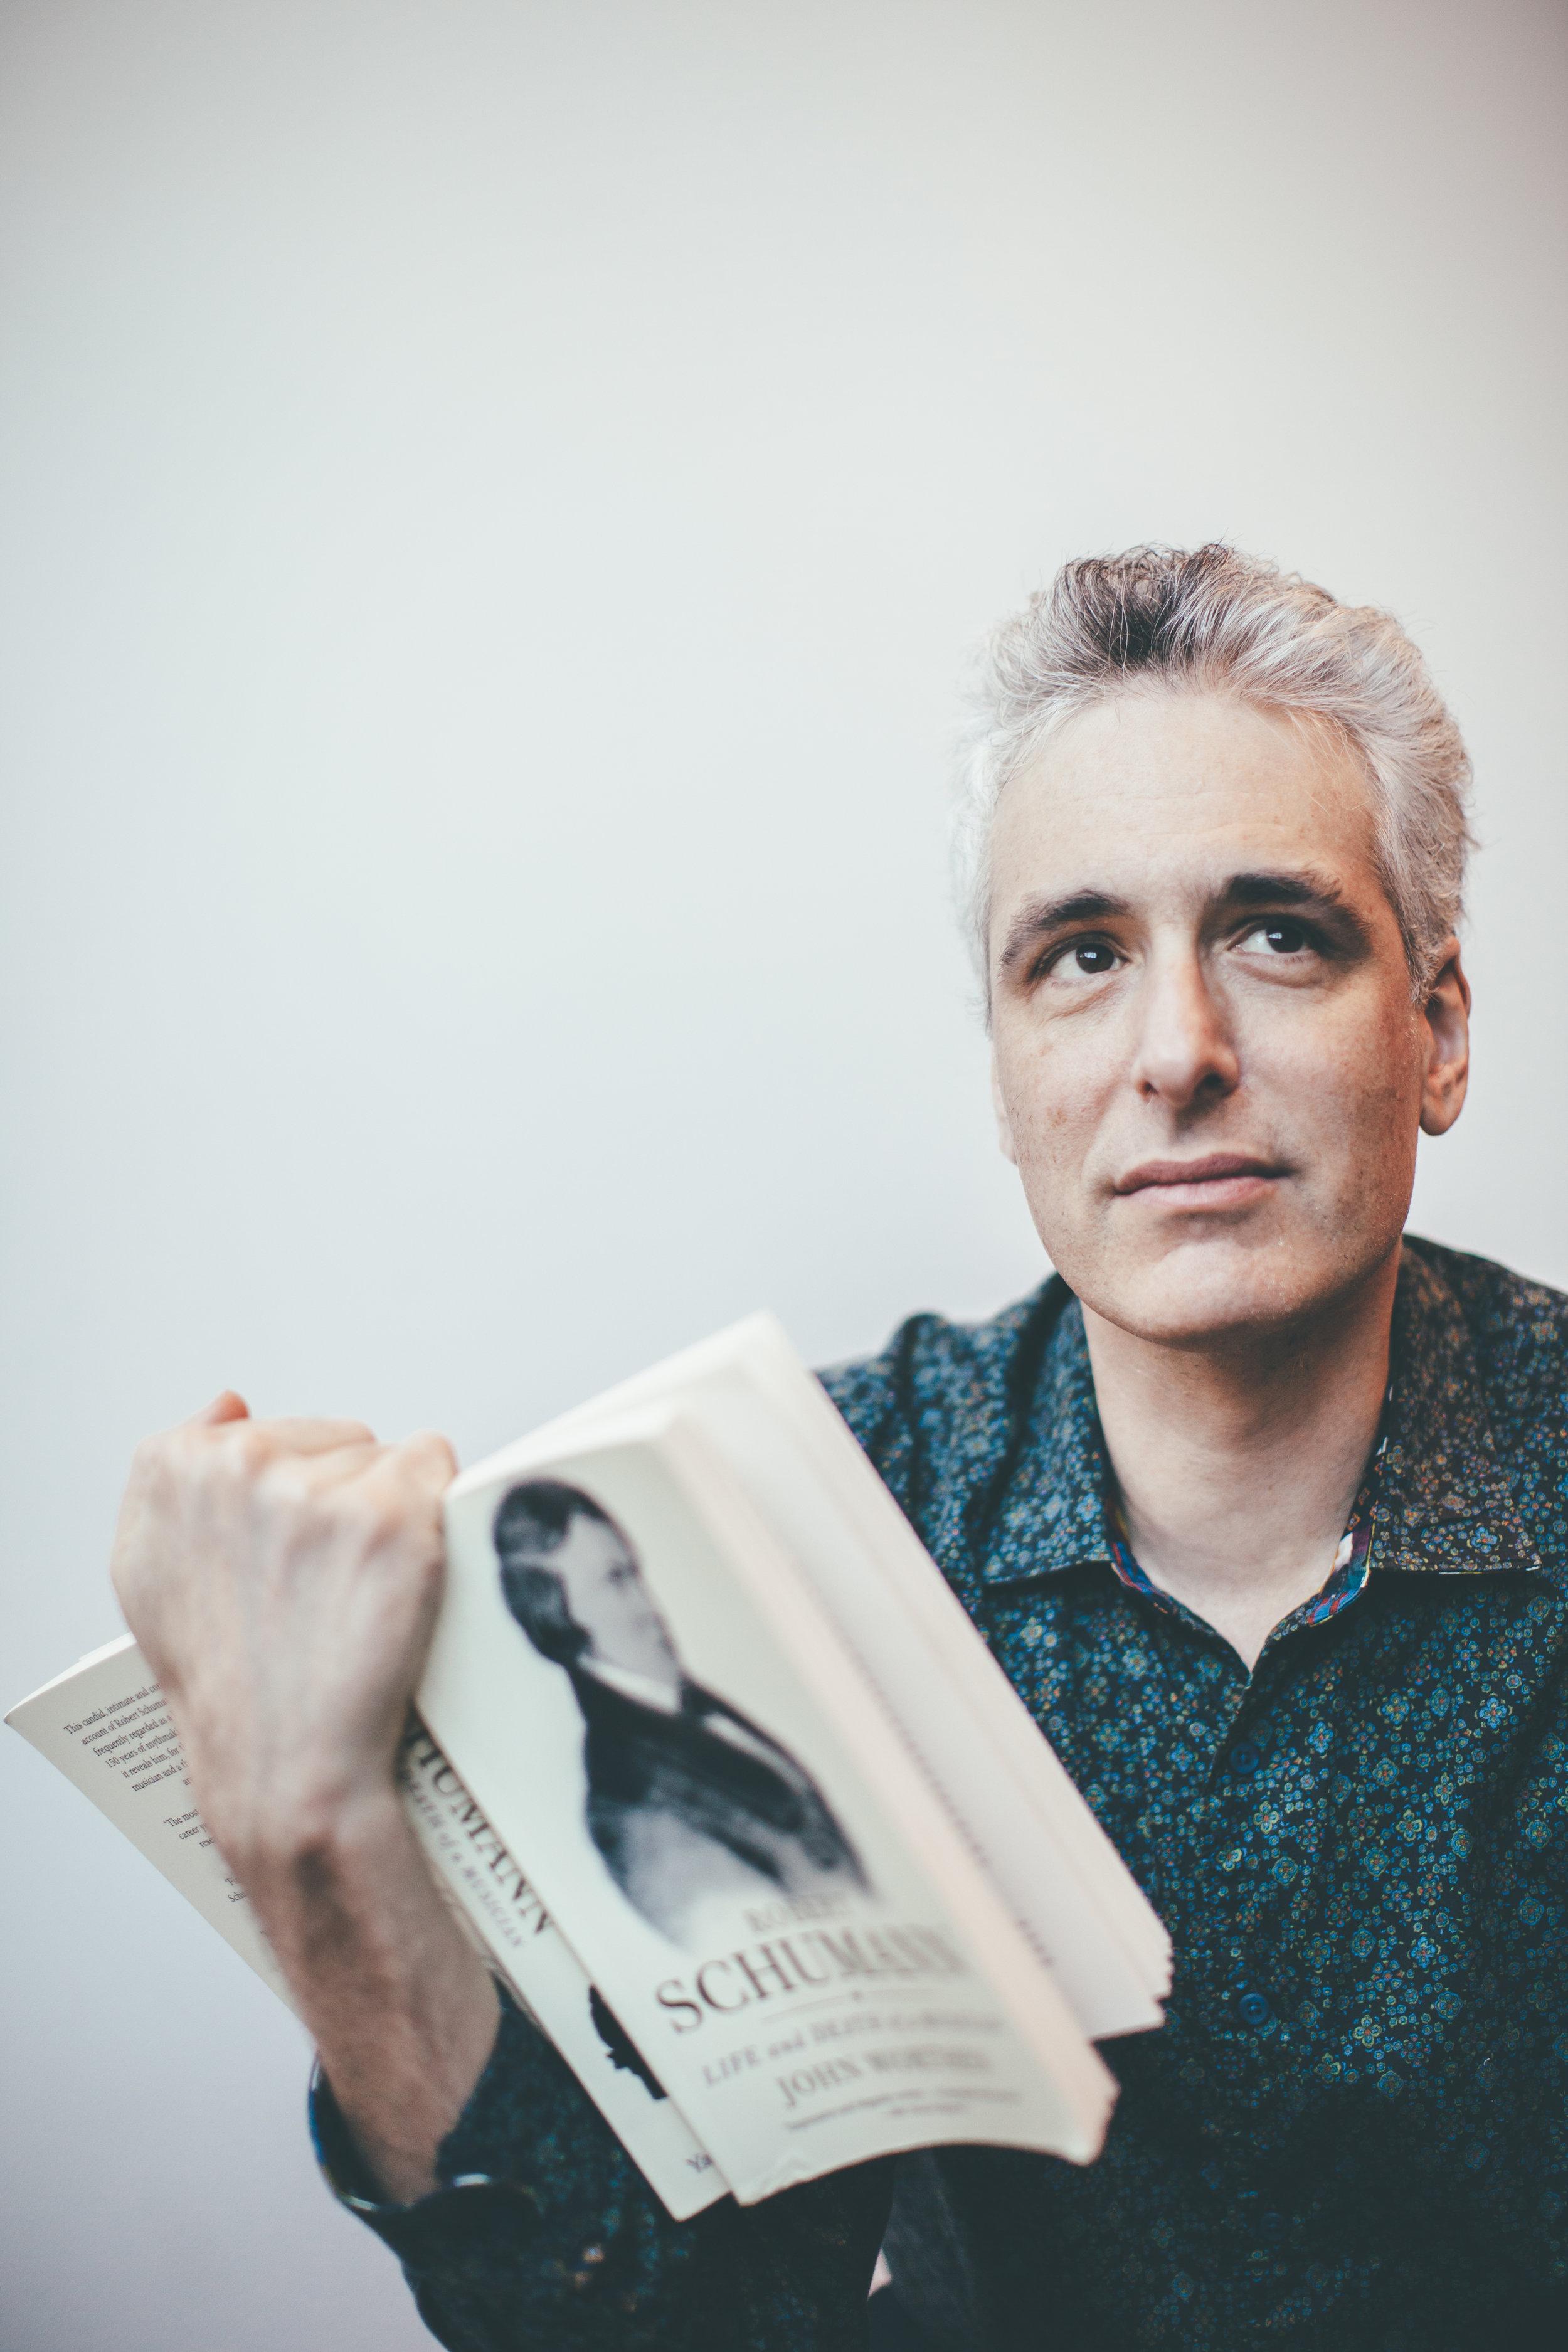 Eric Zivian. piano, composer